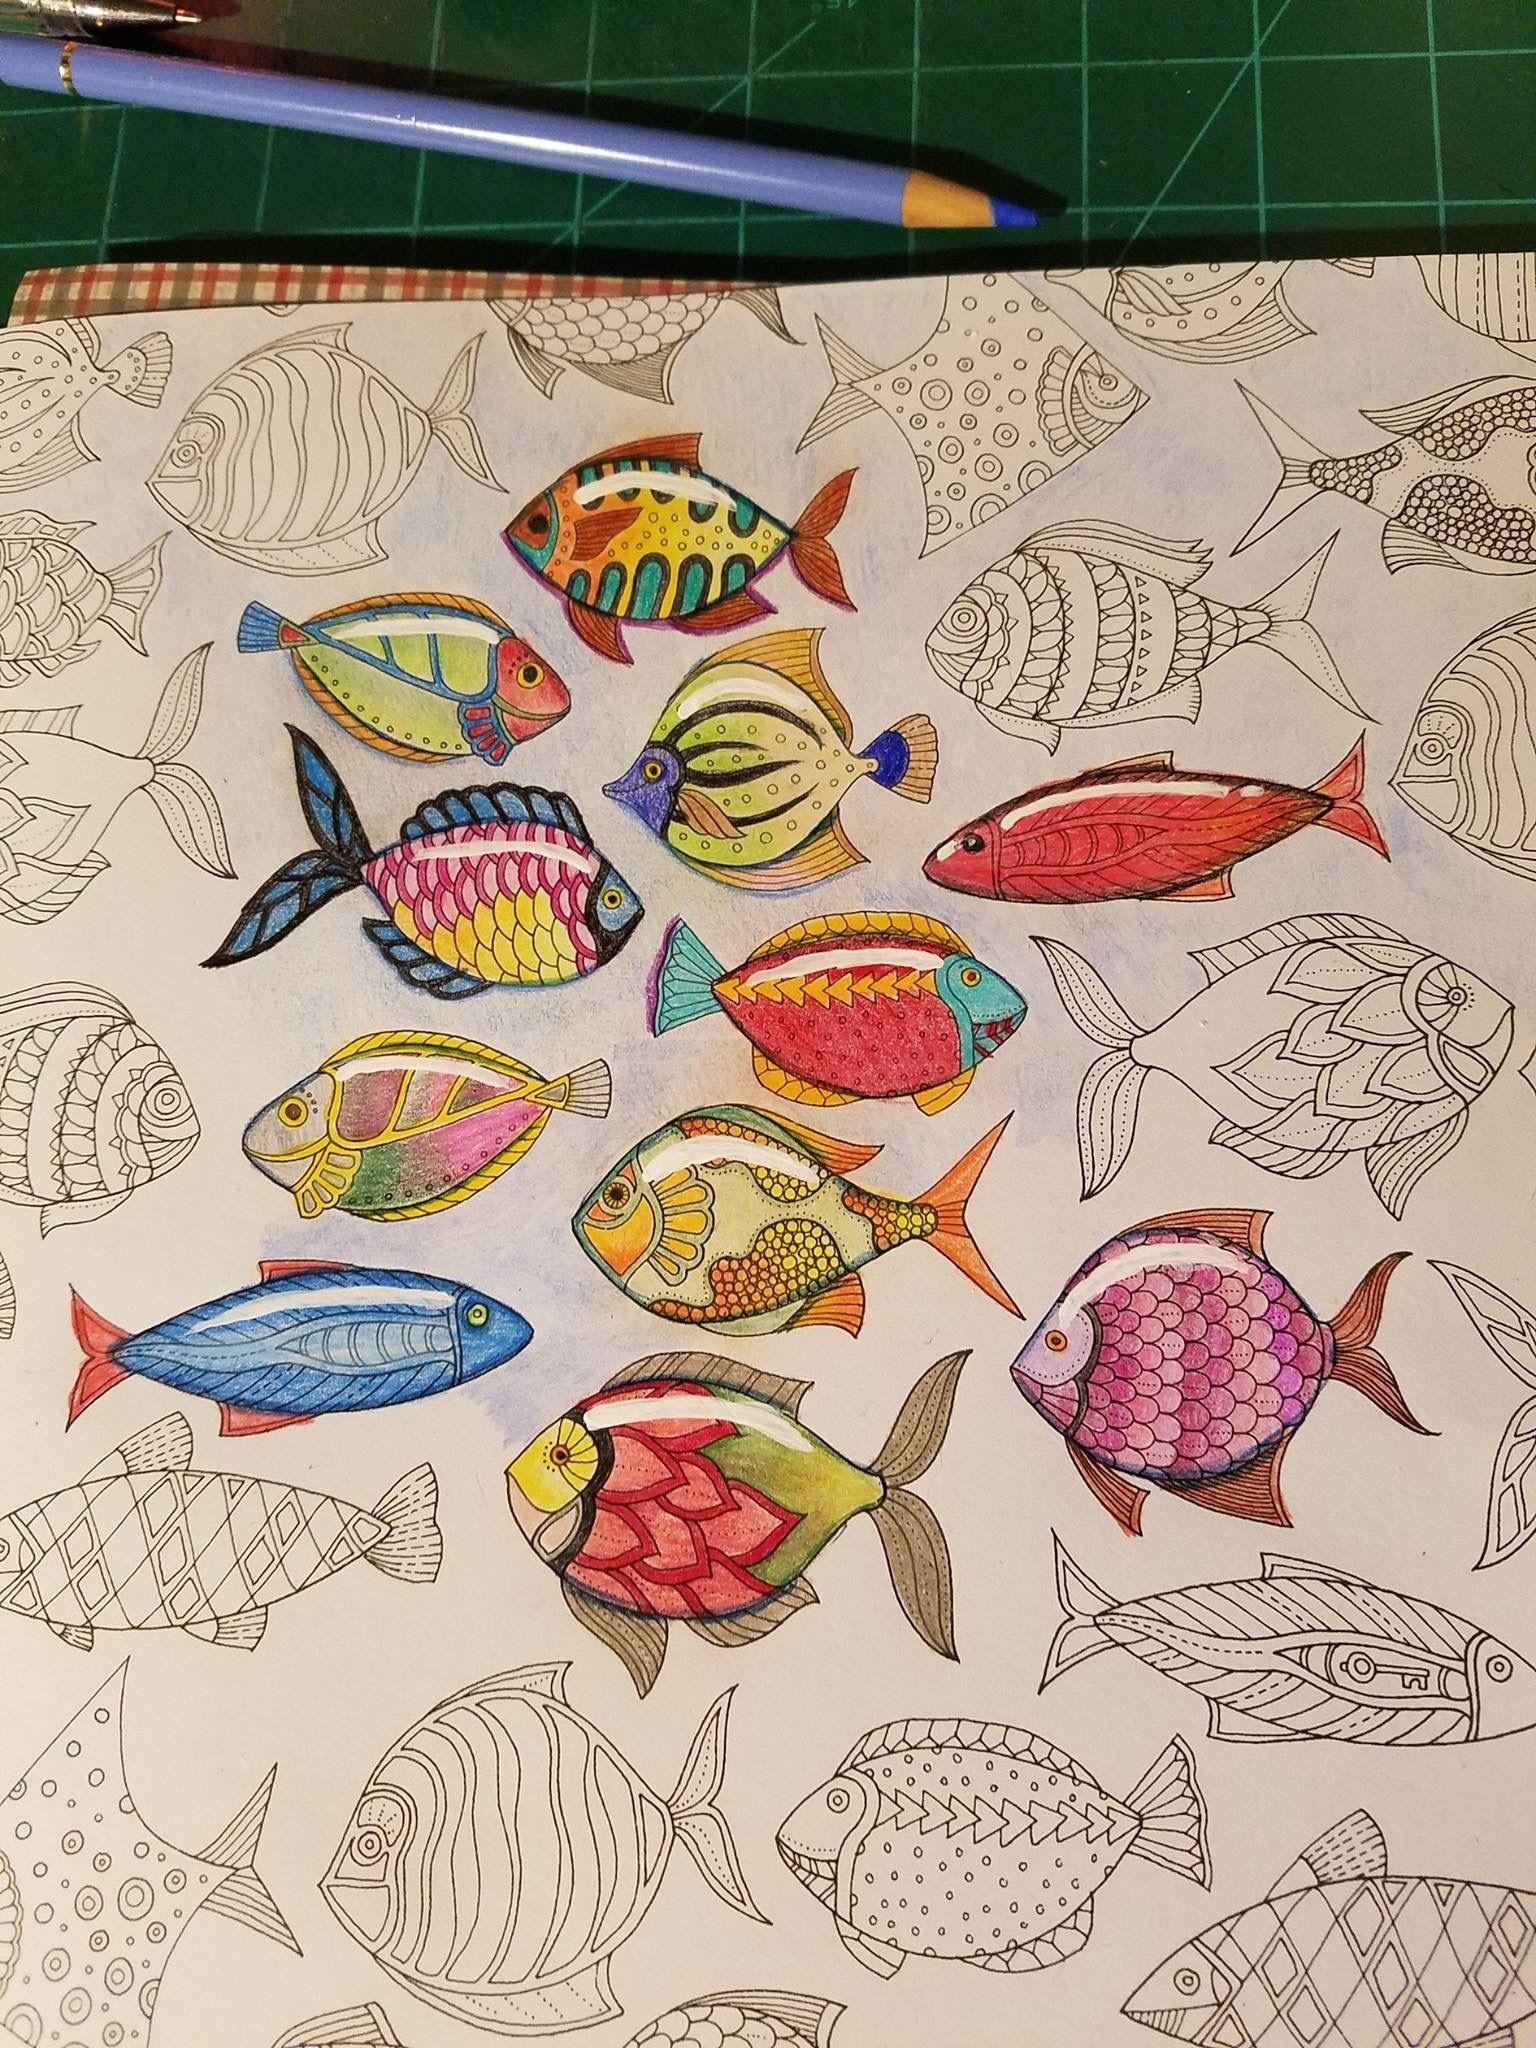 Johanna Basford Books Ocean Colors Joanna Coloring Colouring Prismacolor Color Combinations Pencil Vintage